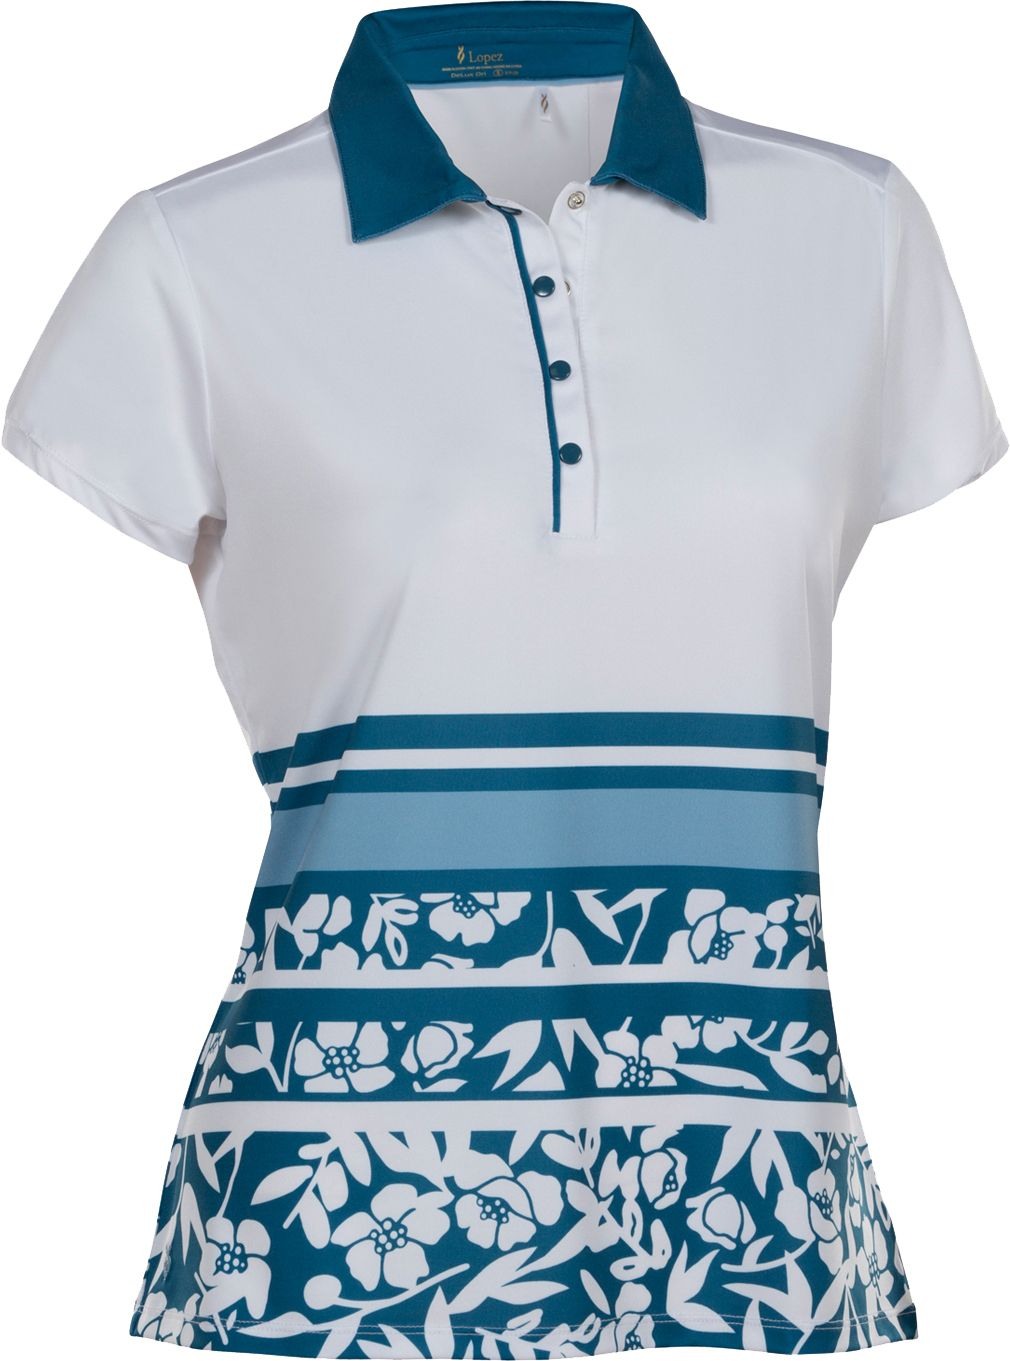 cec7f42be88a6 Nancy Lopez Women s Pretty Short Sleeve Golf Polo - Plus Size